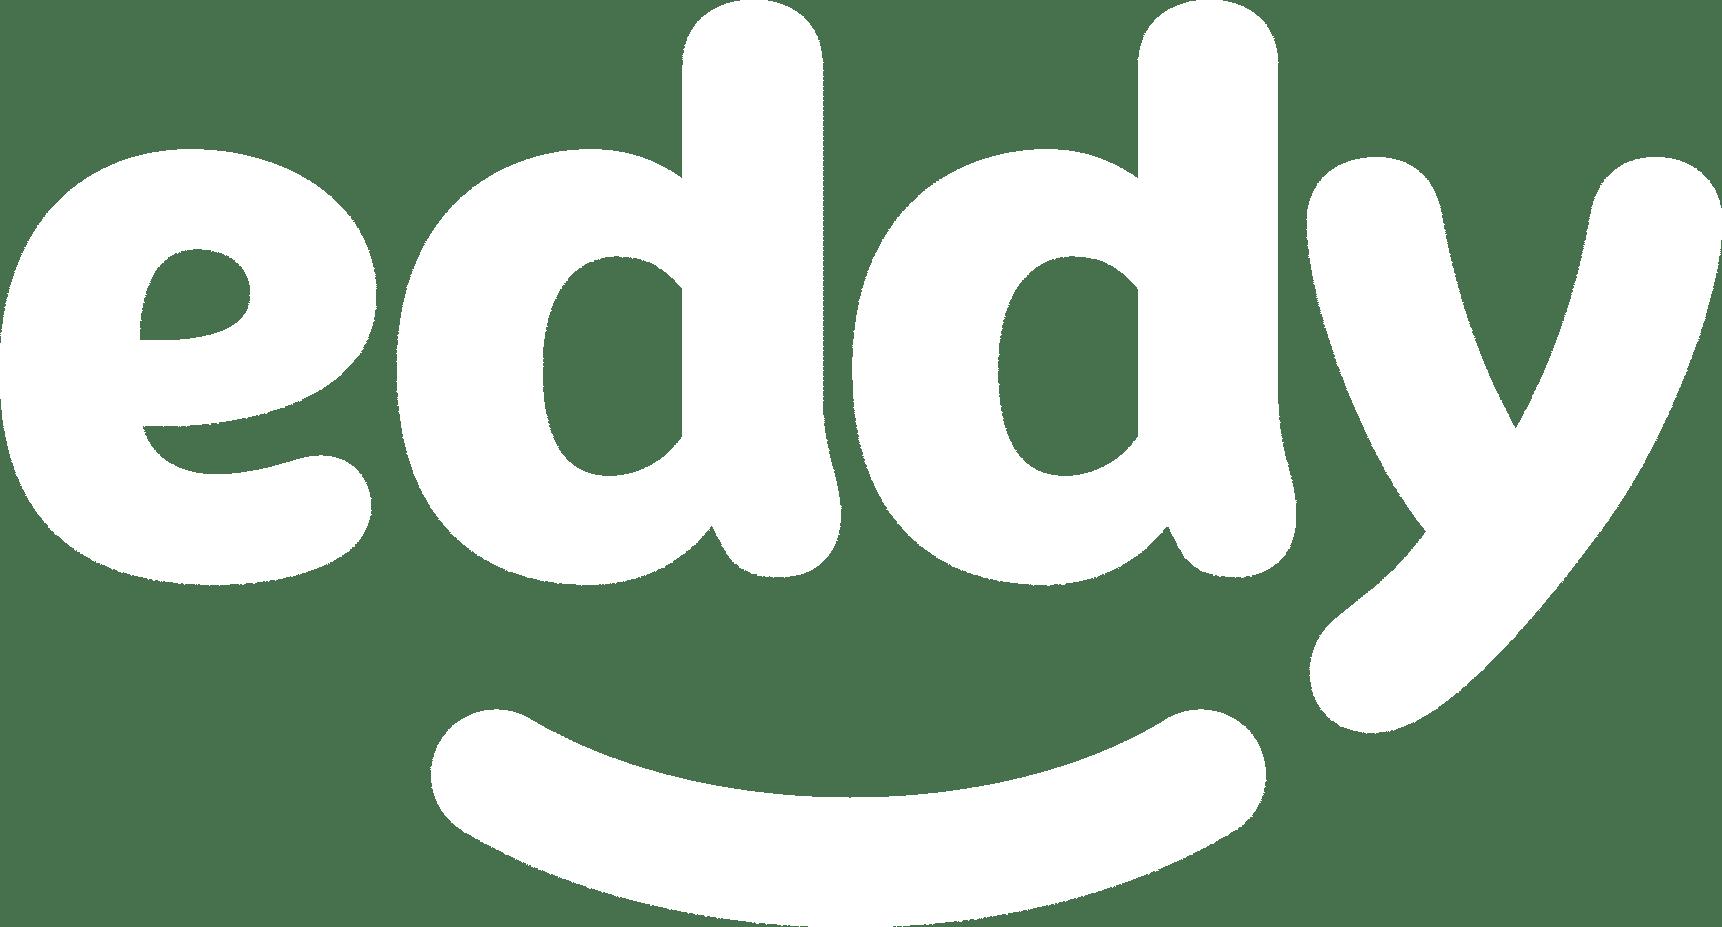 EddyHR Logo